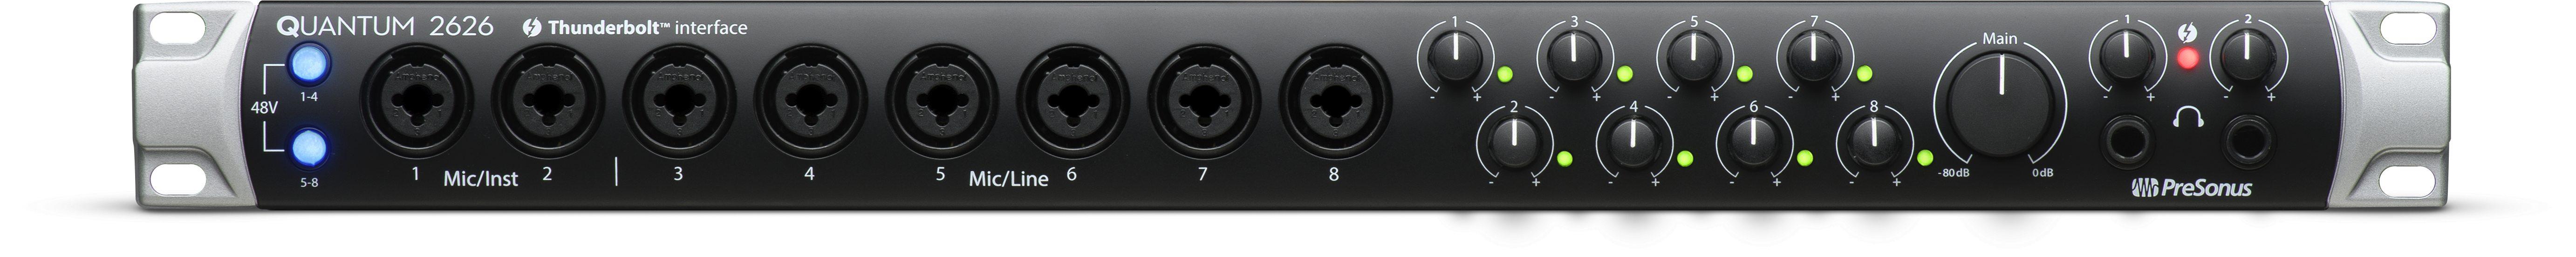 Thunderbolt 3 audio interface from PreSonus